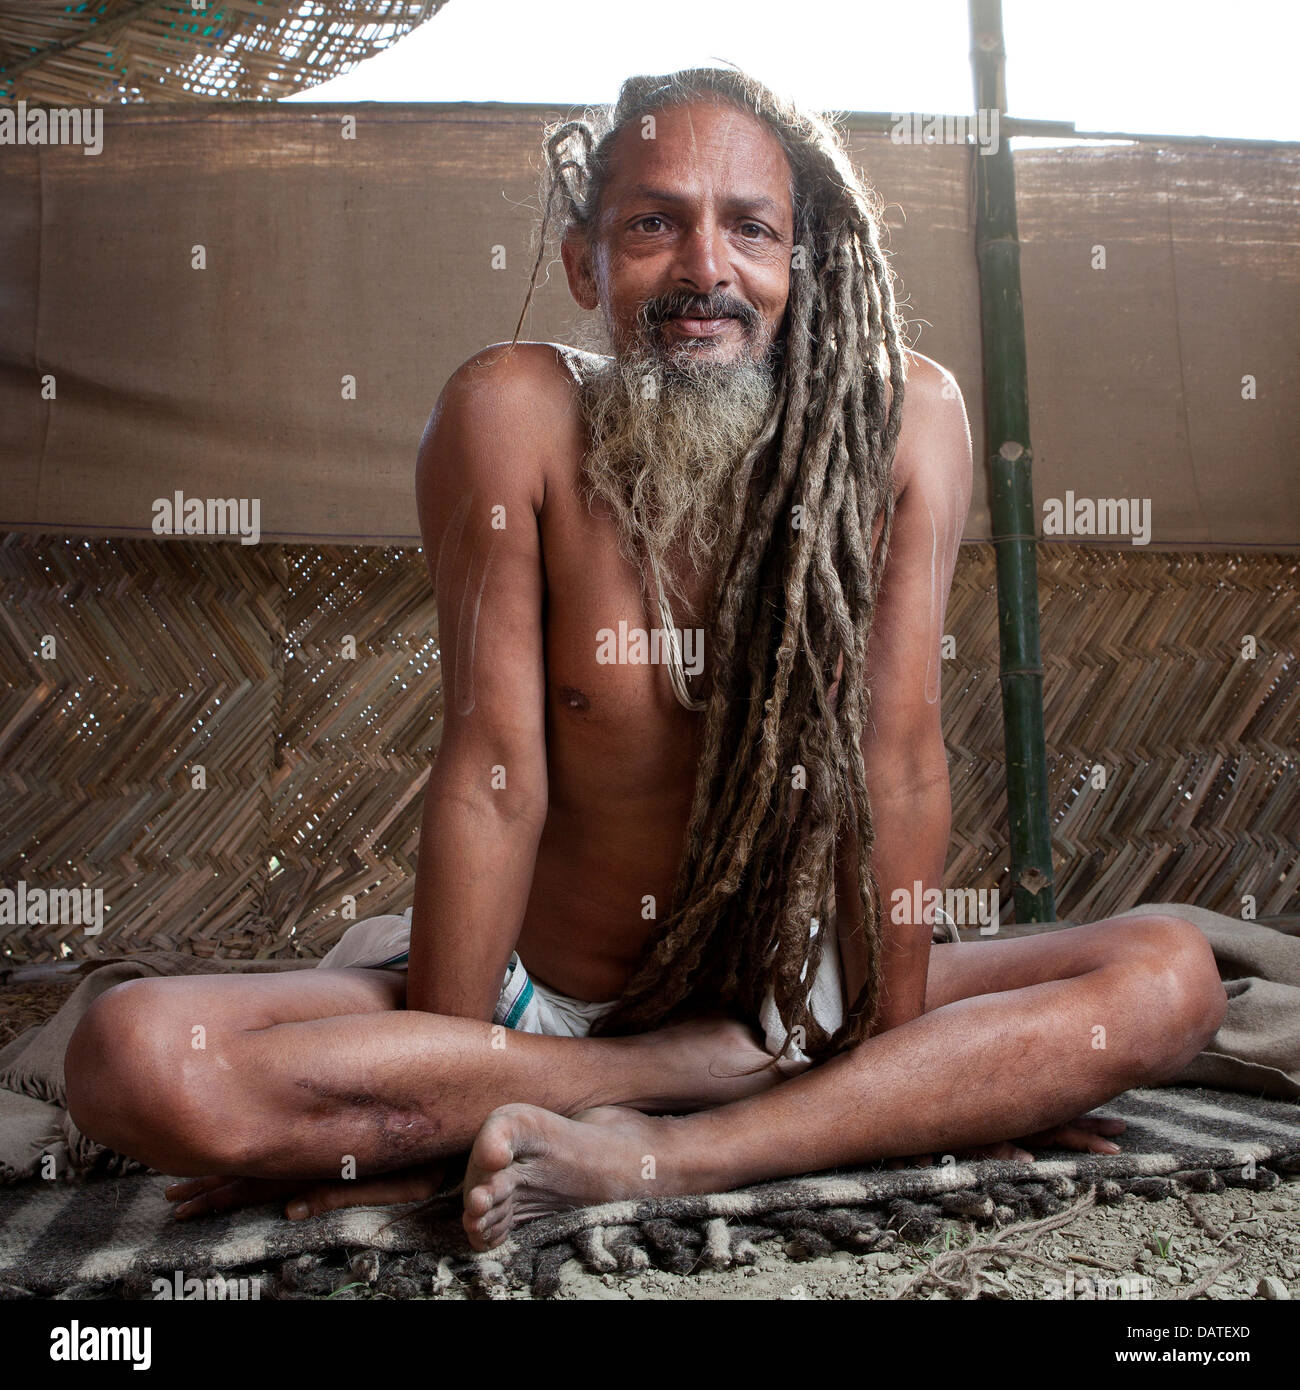 Dating a yogi man